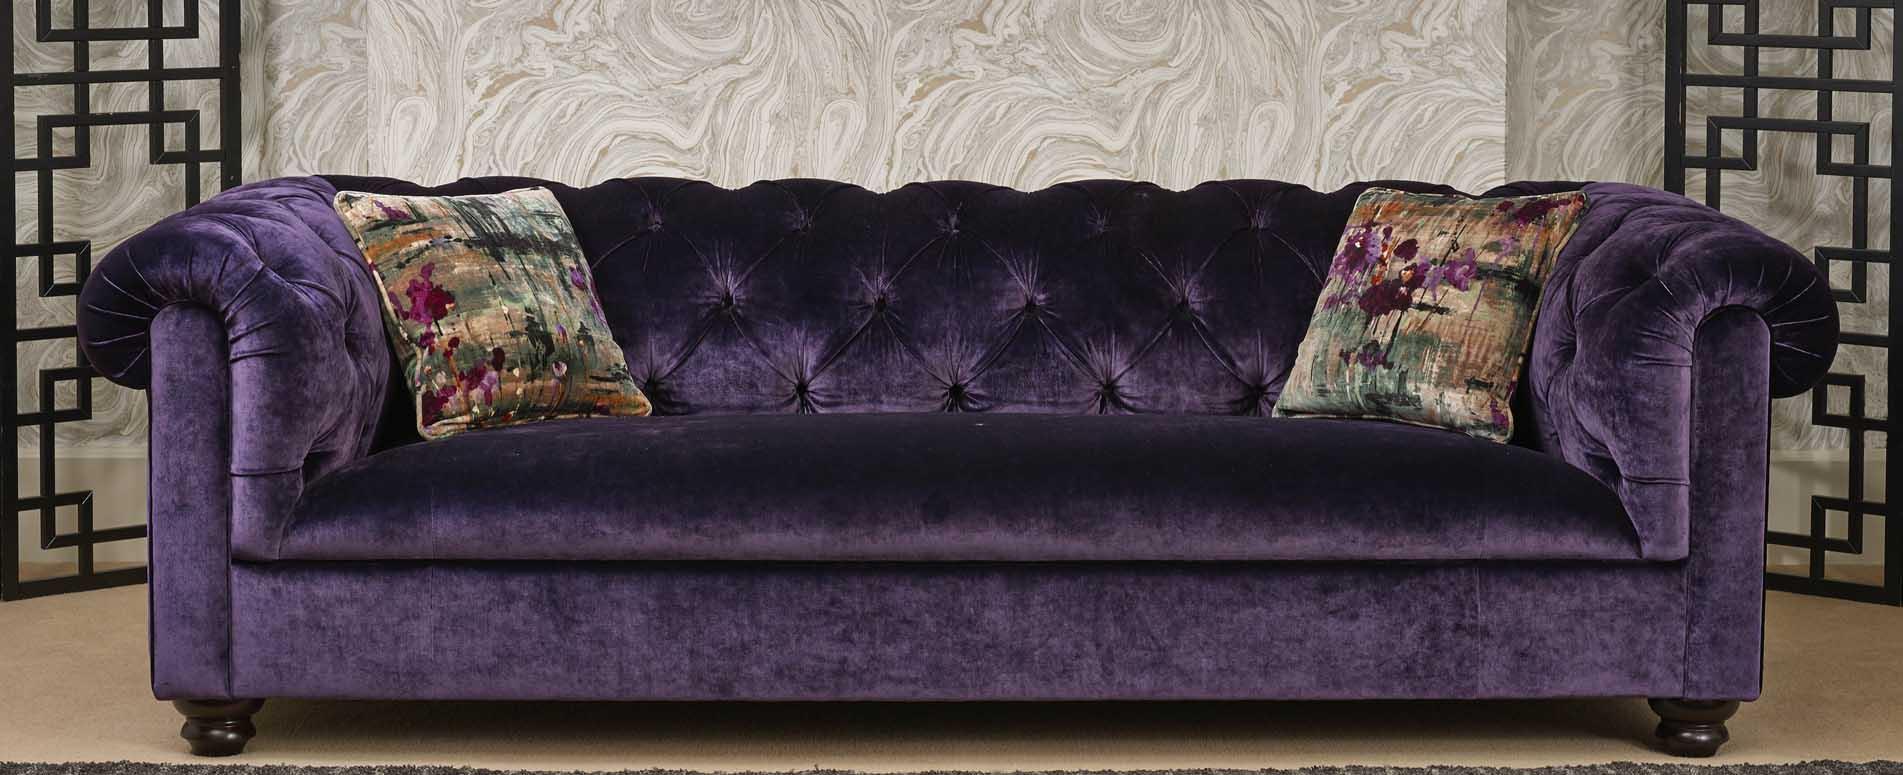 sofa upholsterers leicester ashley sleeper chaise nicky stephen marketing